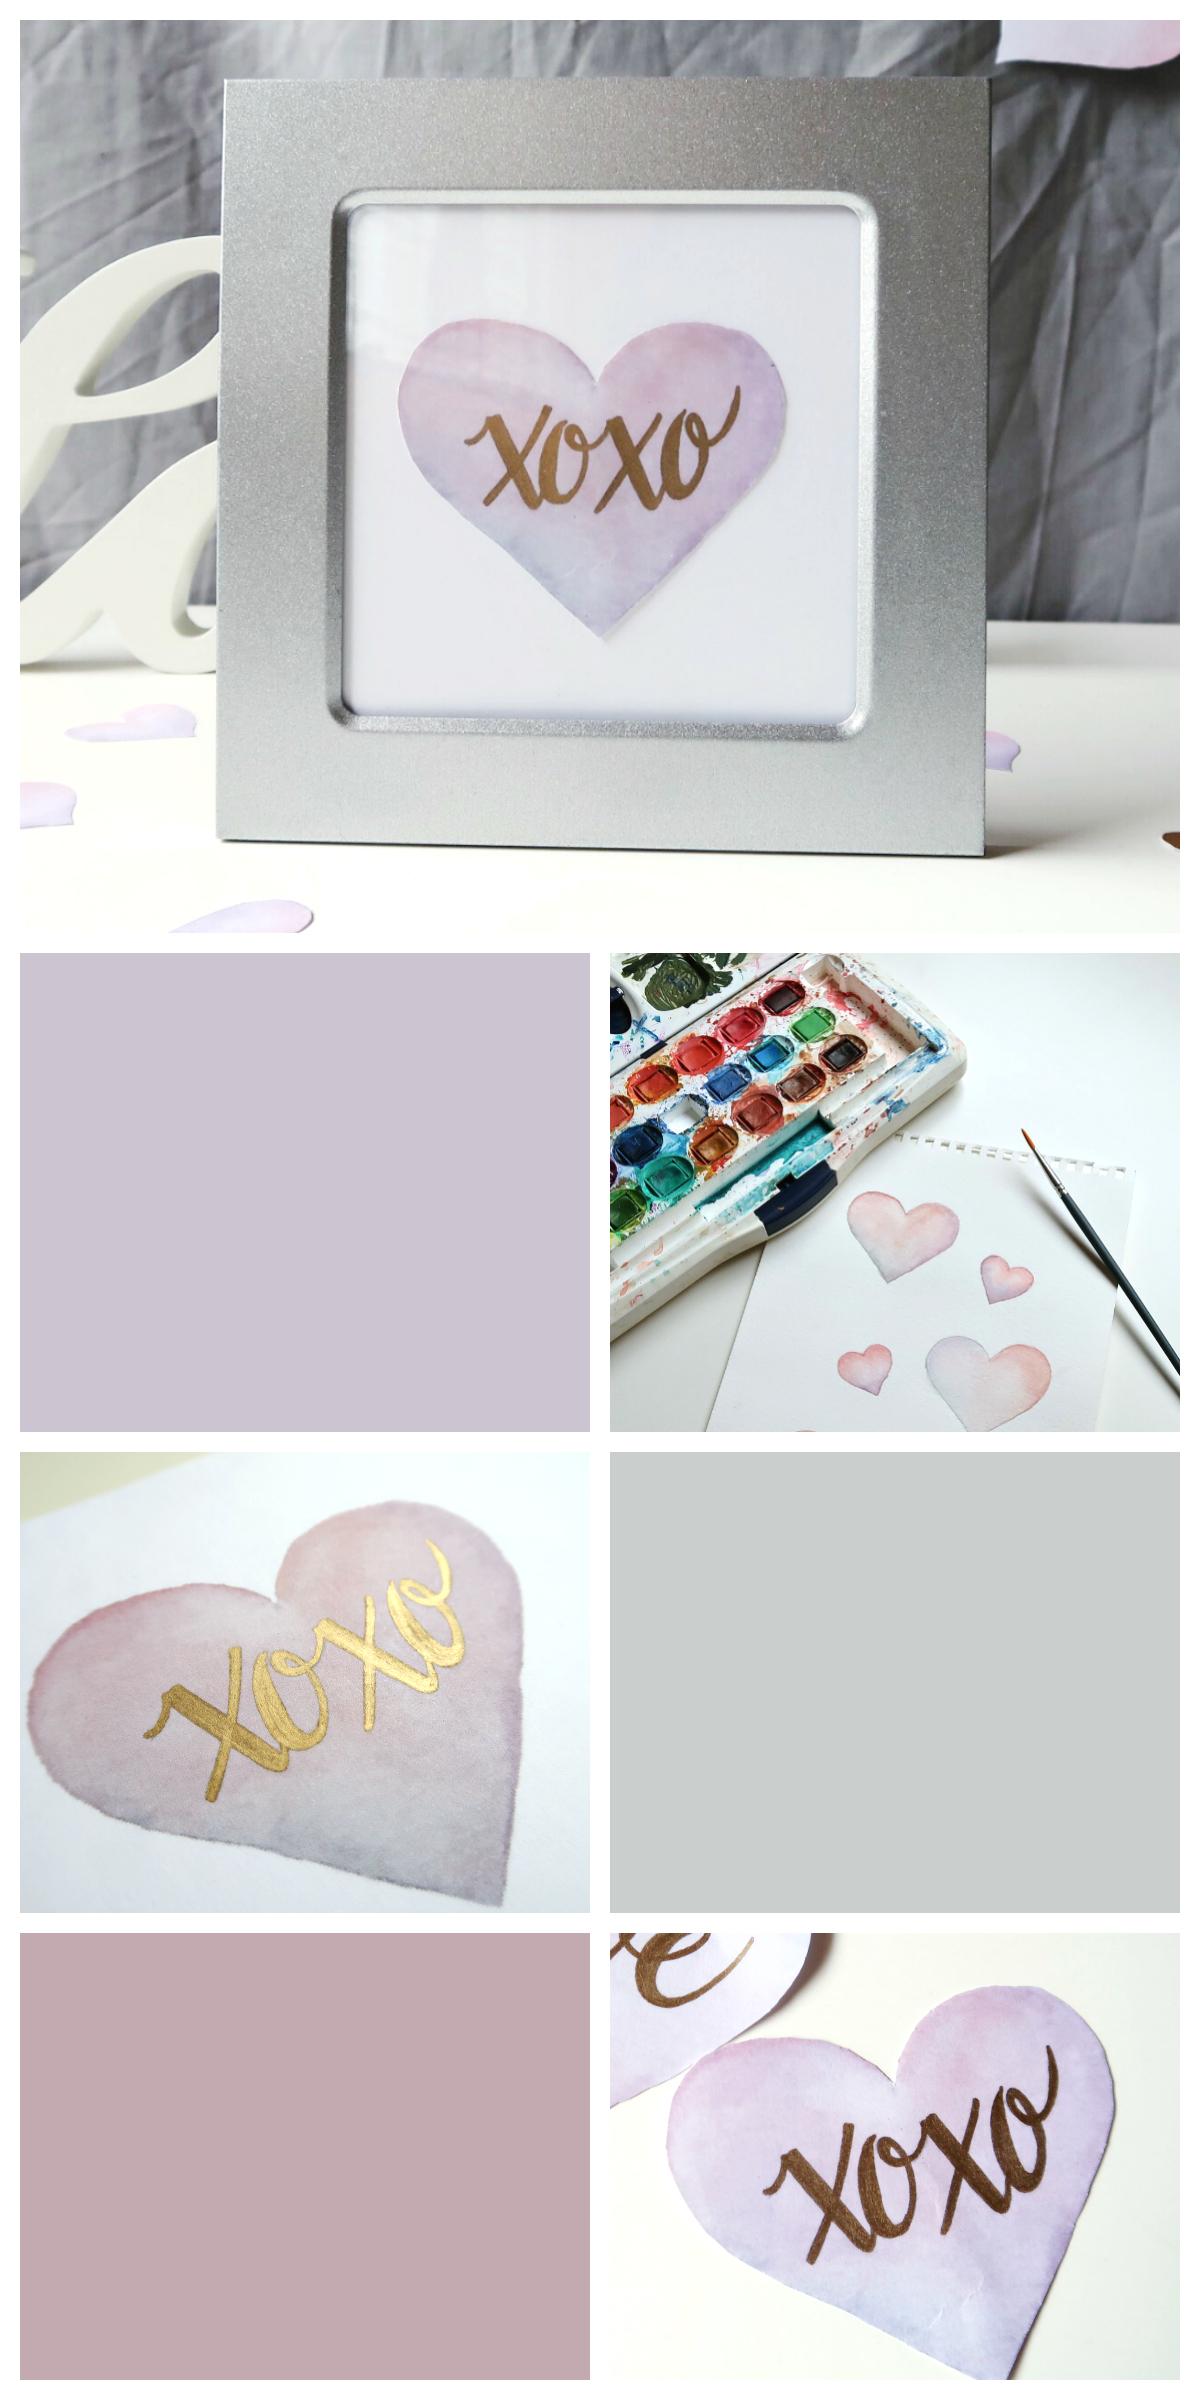 Watercolour Hearts DIY by Isoscella